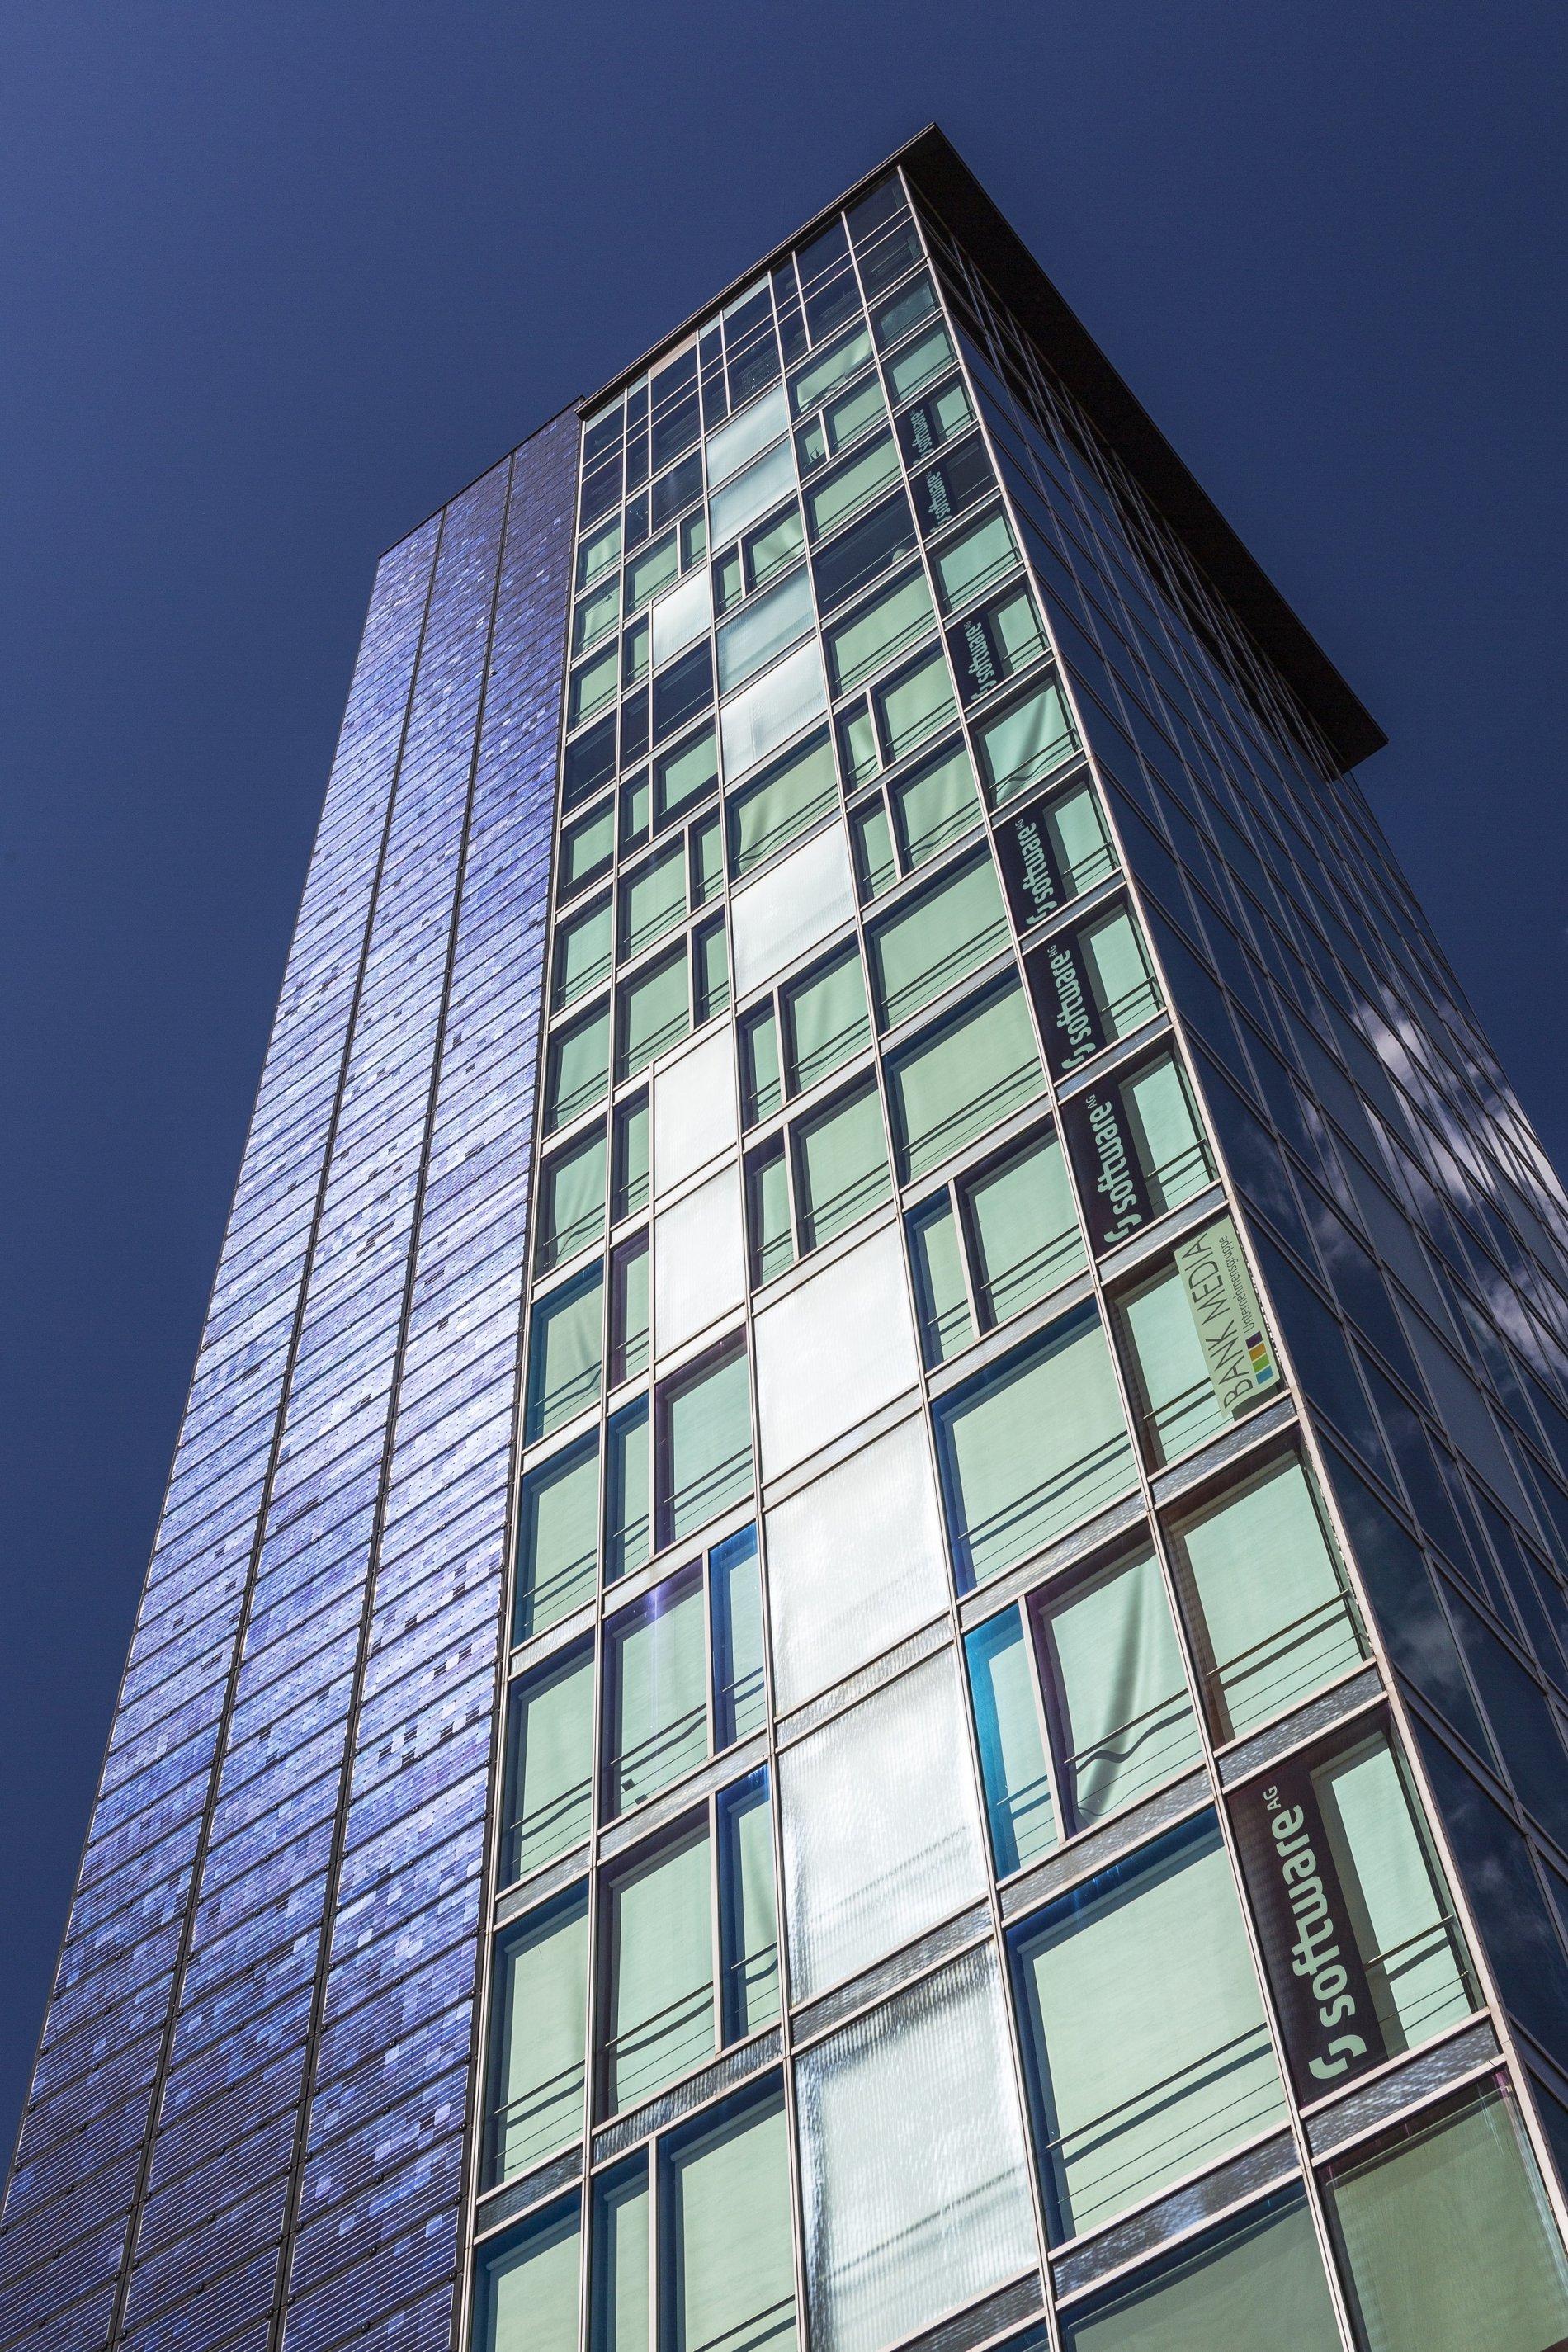 Freiburg Solar Tower